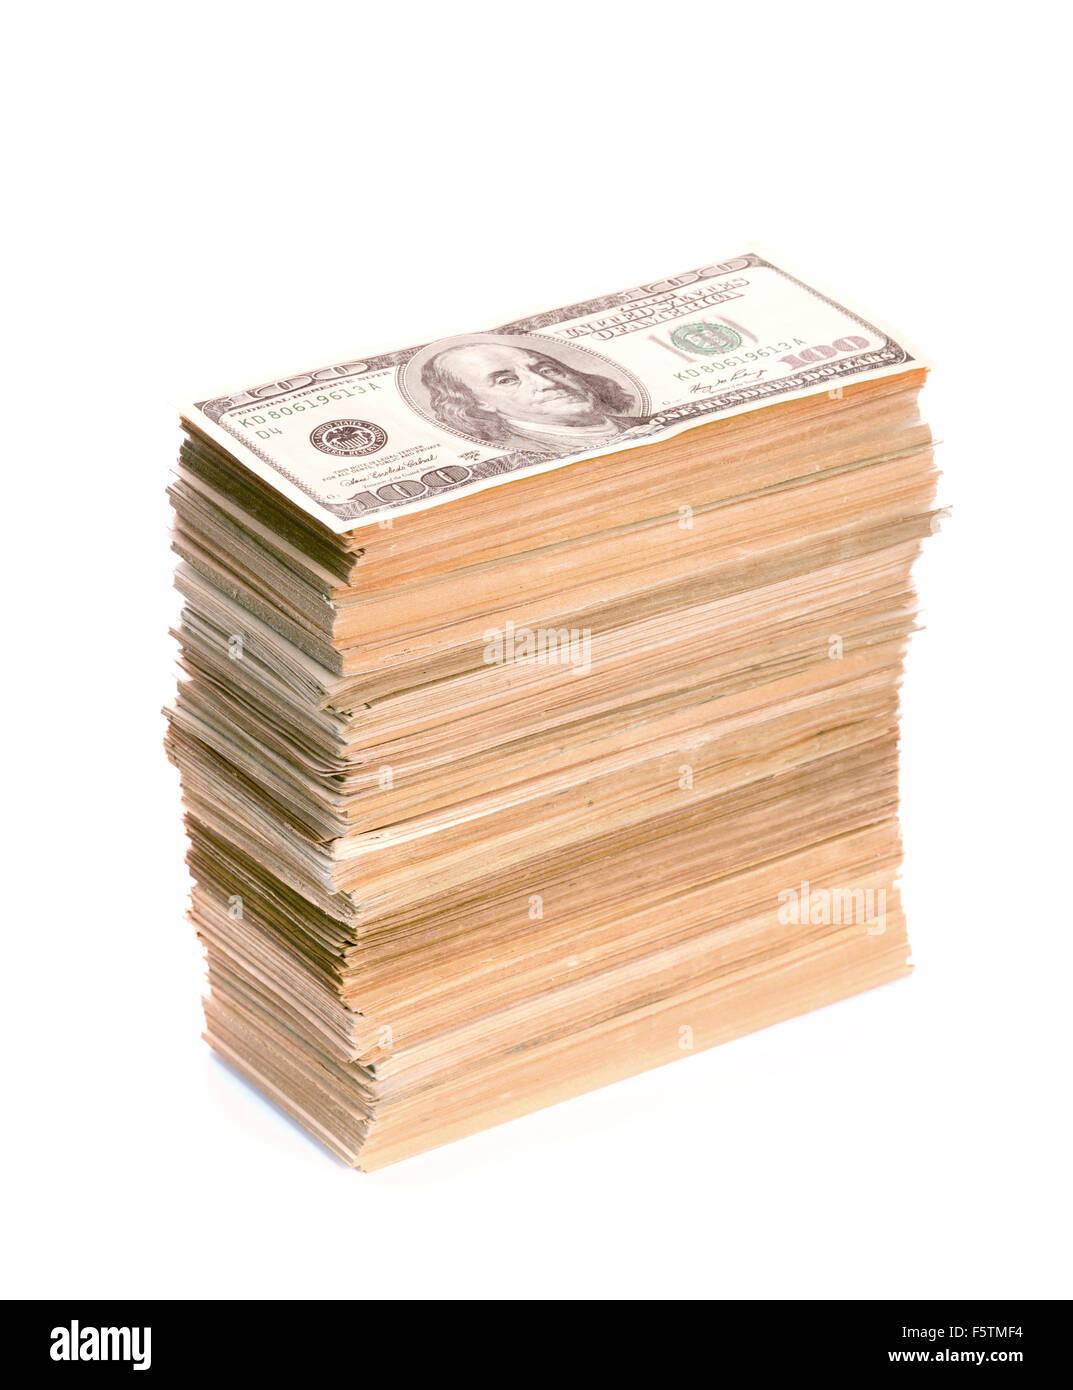 Pile de billets en dollars libre. Isolated on white Photo Stock